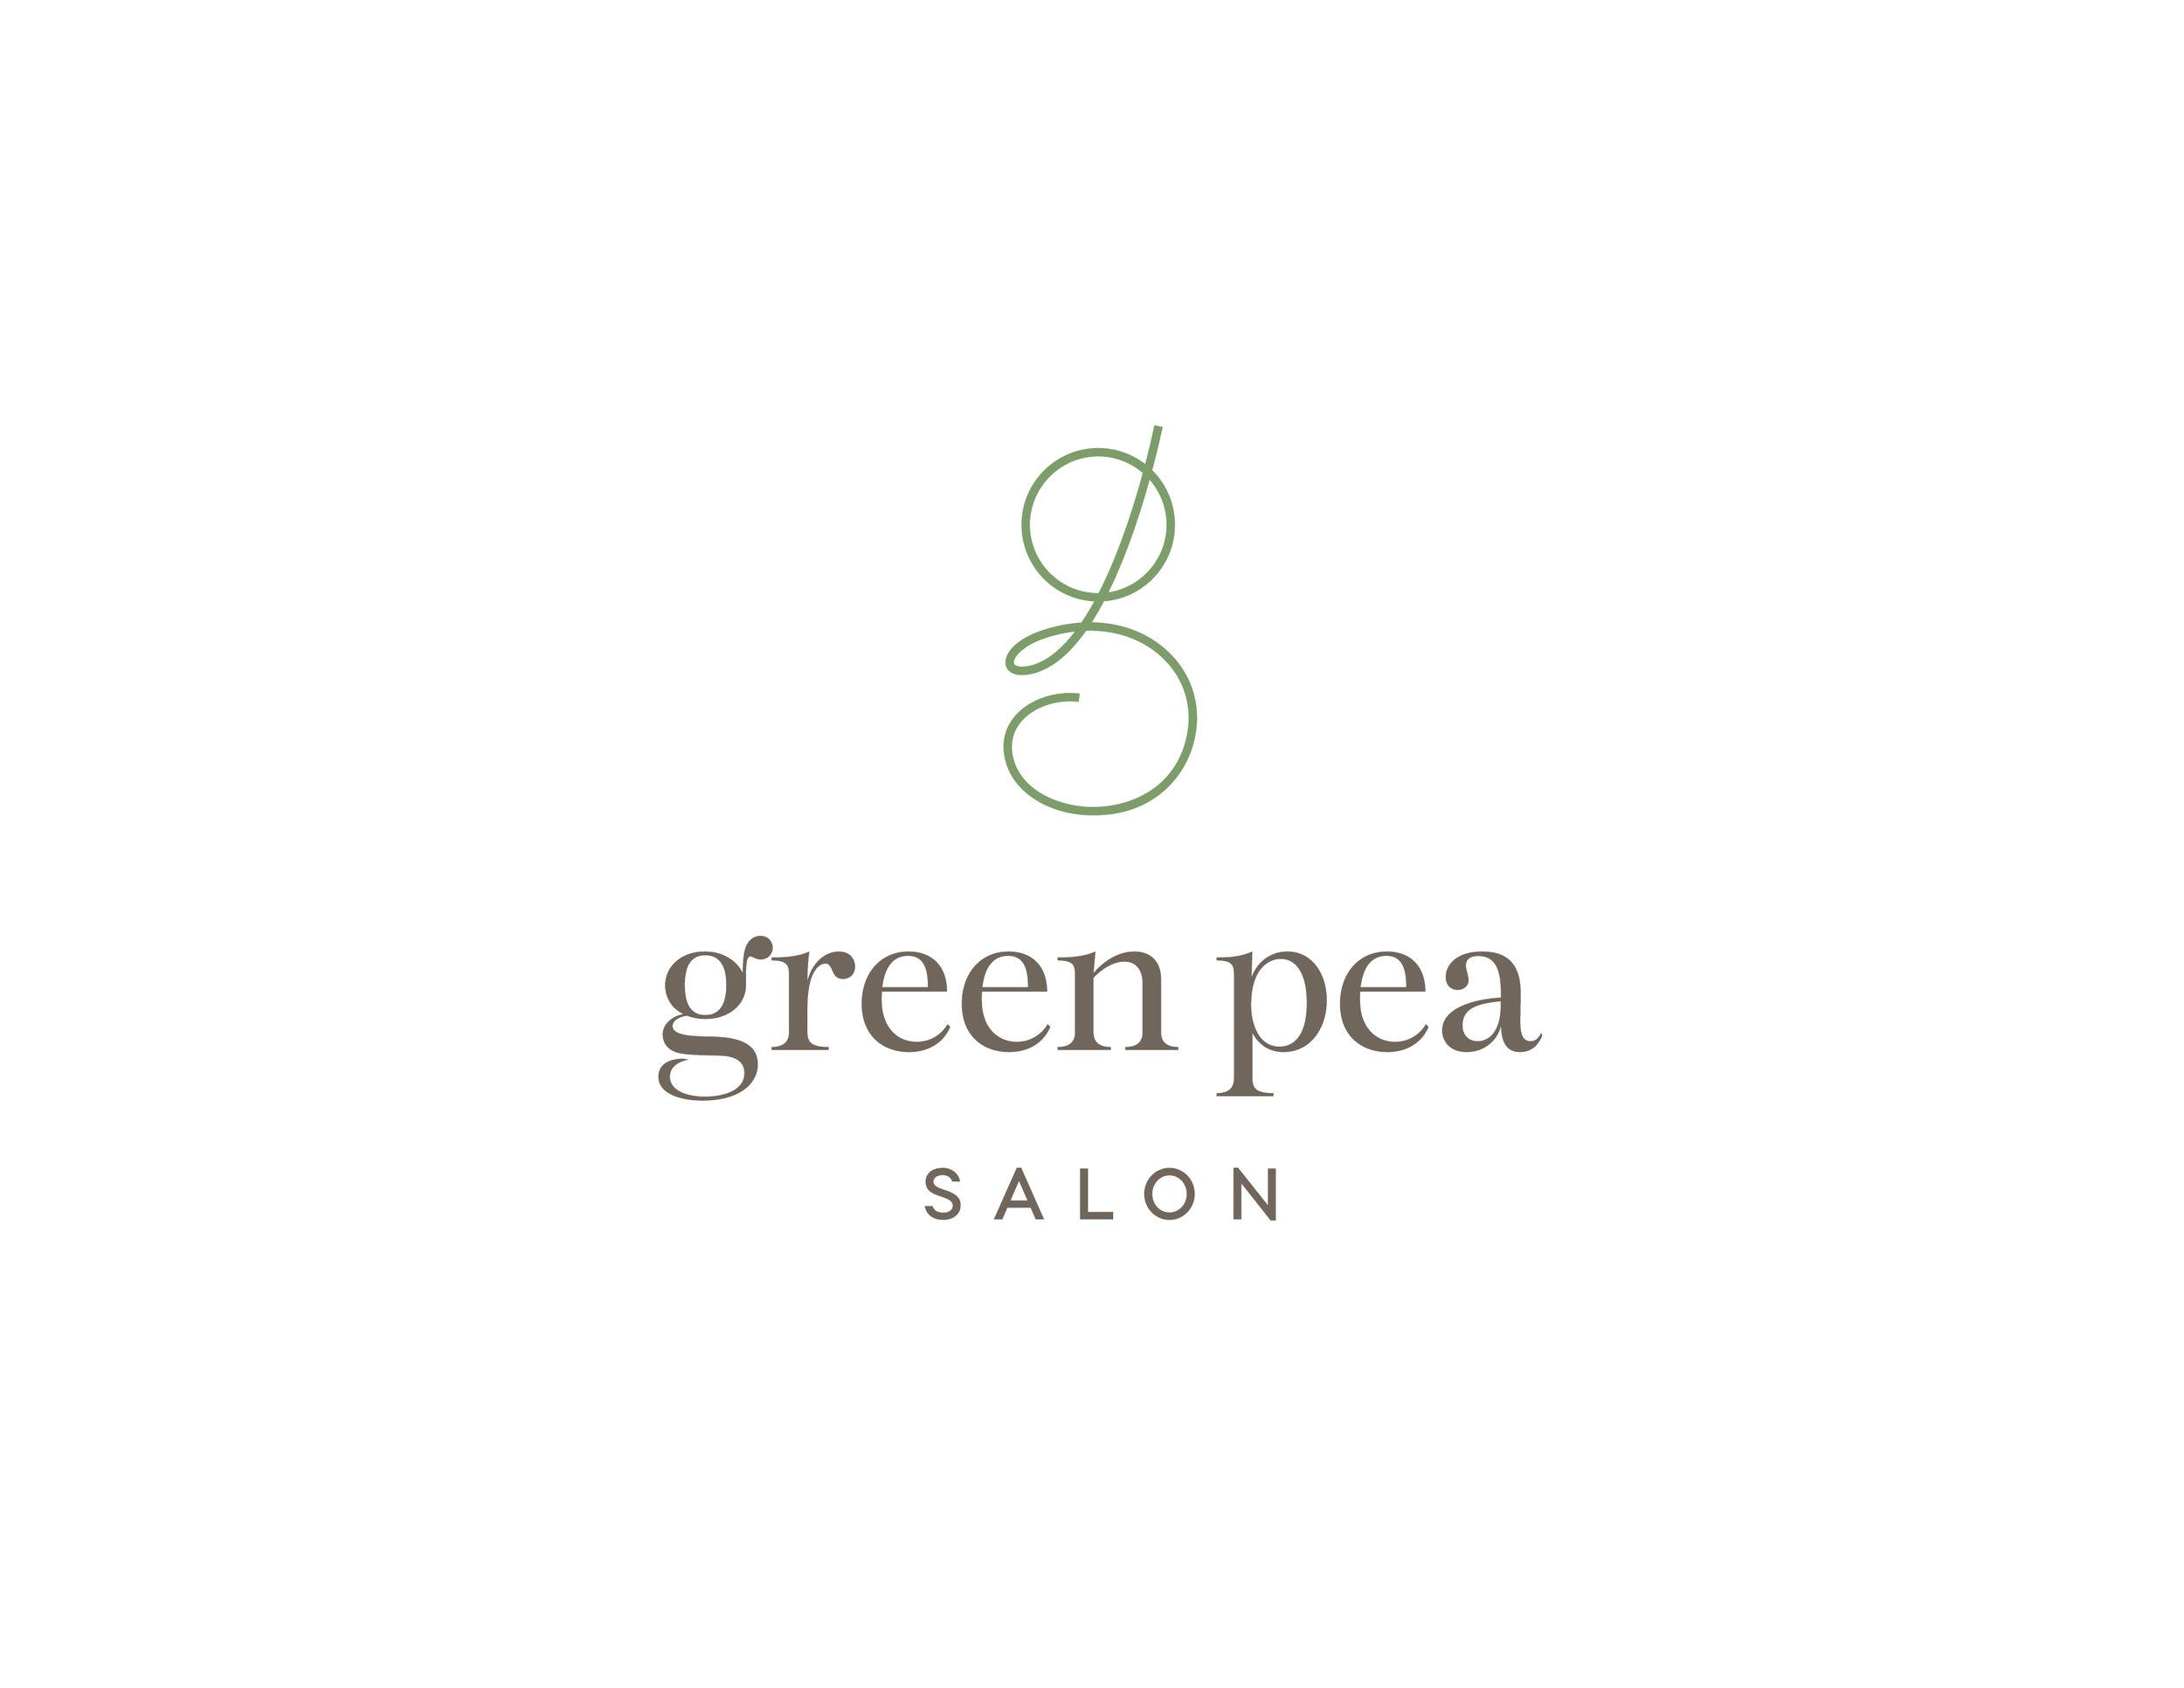 green-pea_logos_RGB-02.jpg